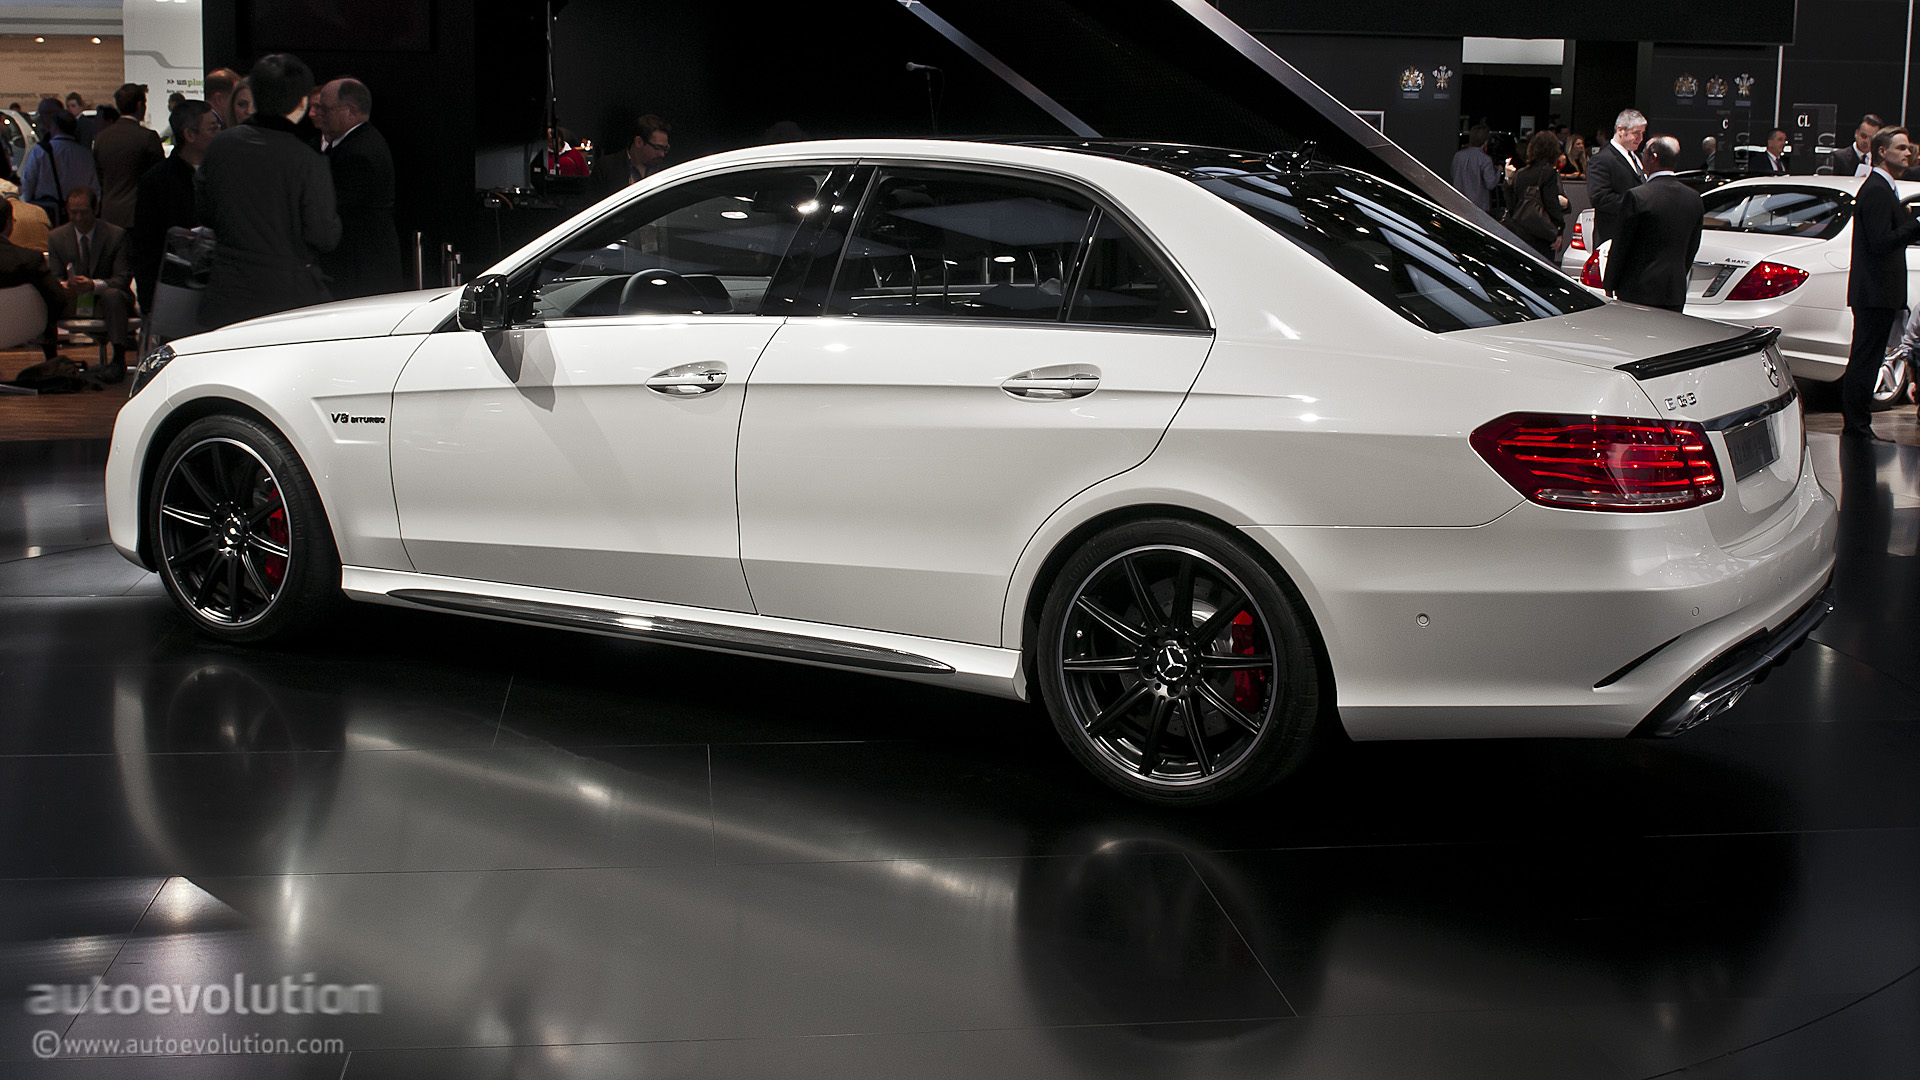 3dtuning Of Mercedes E Class Sedan 2014 3dtuning Com